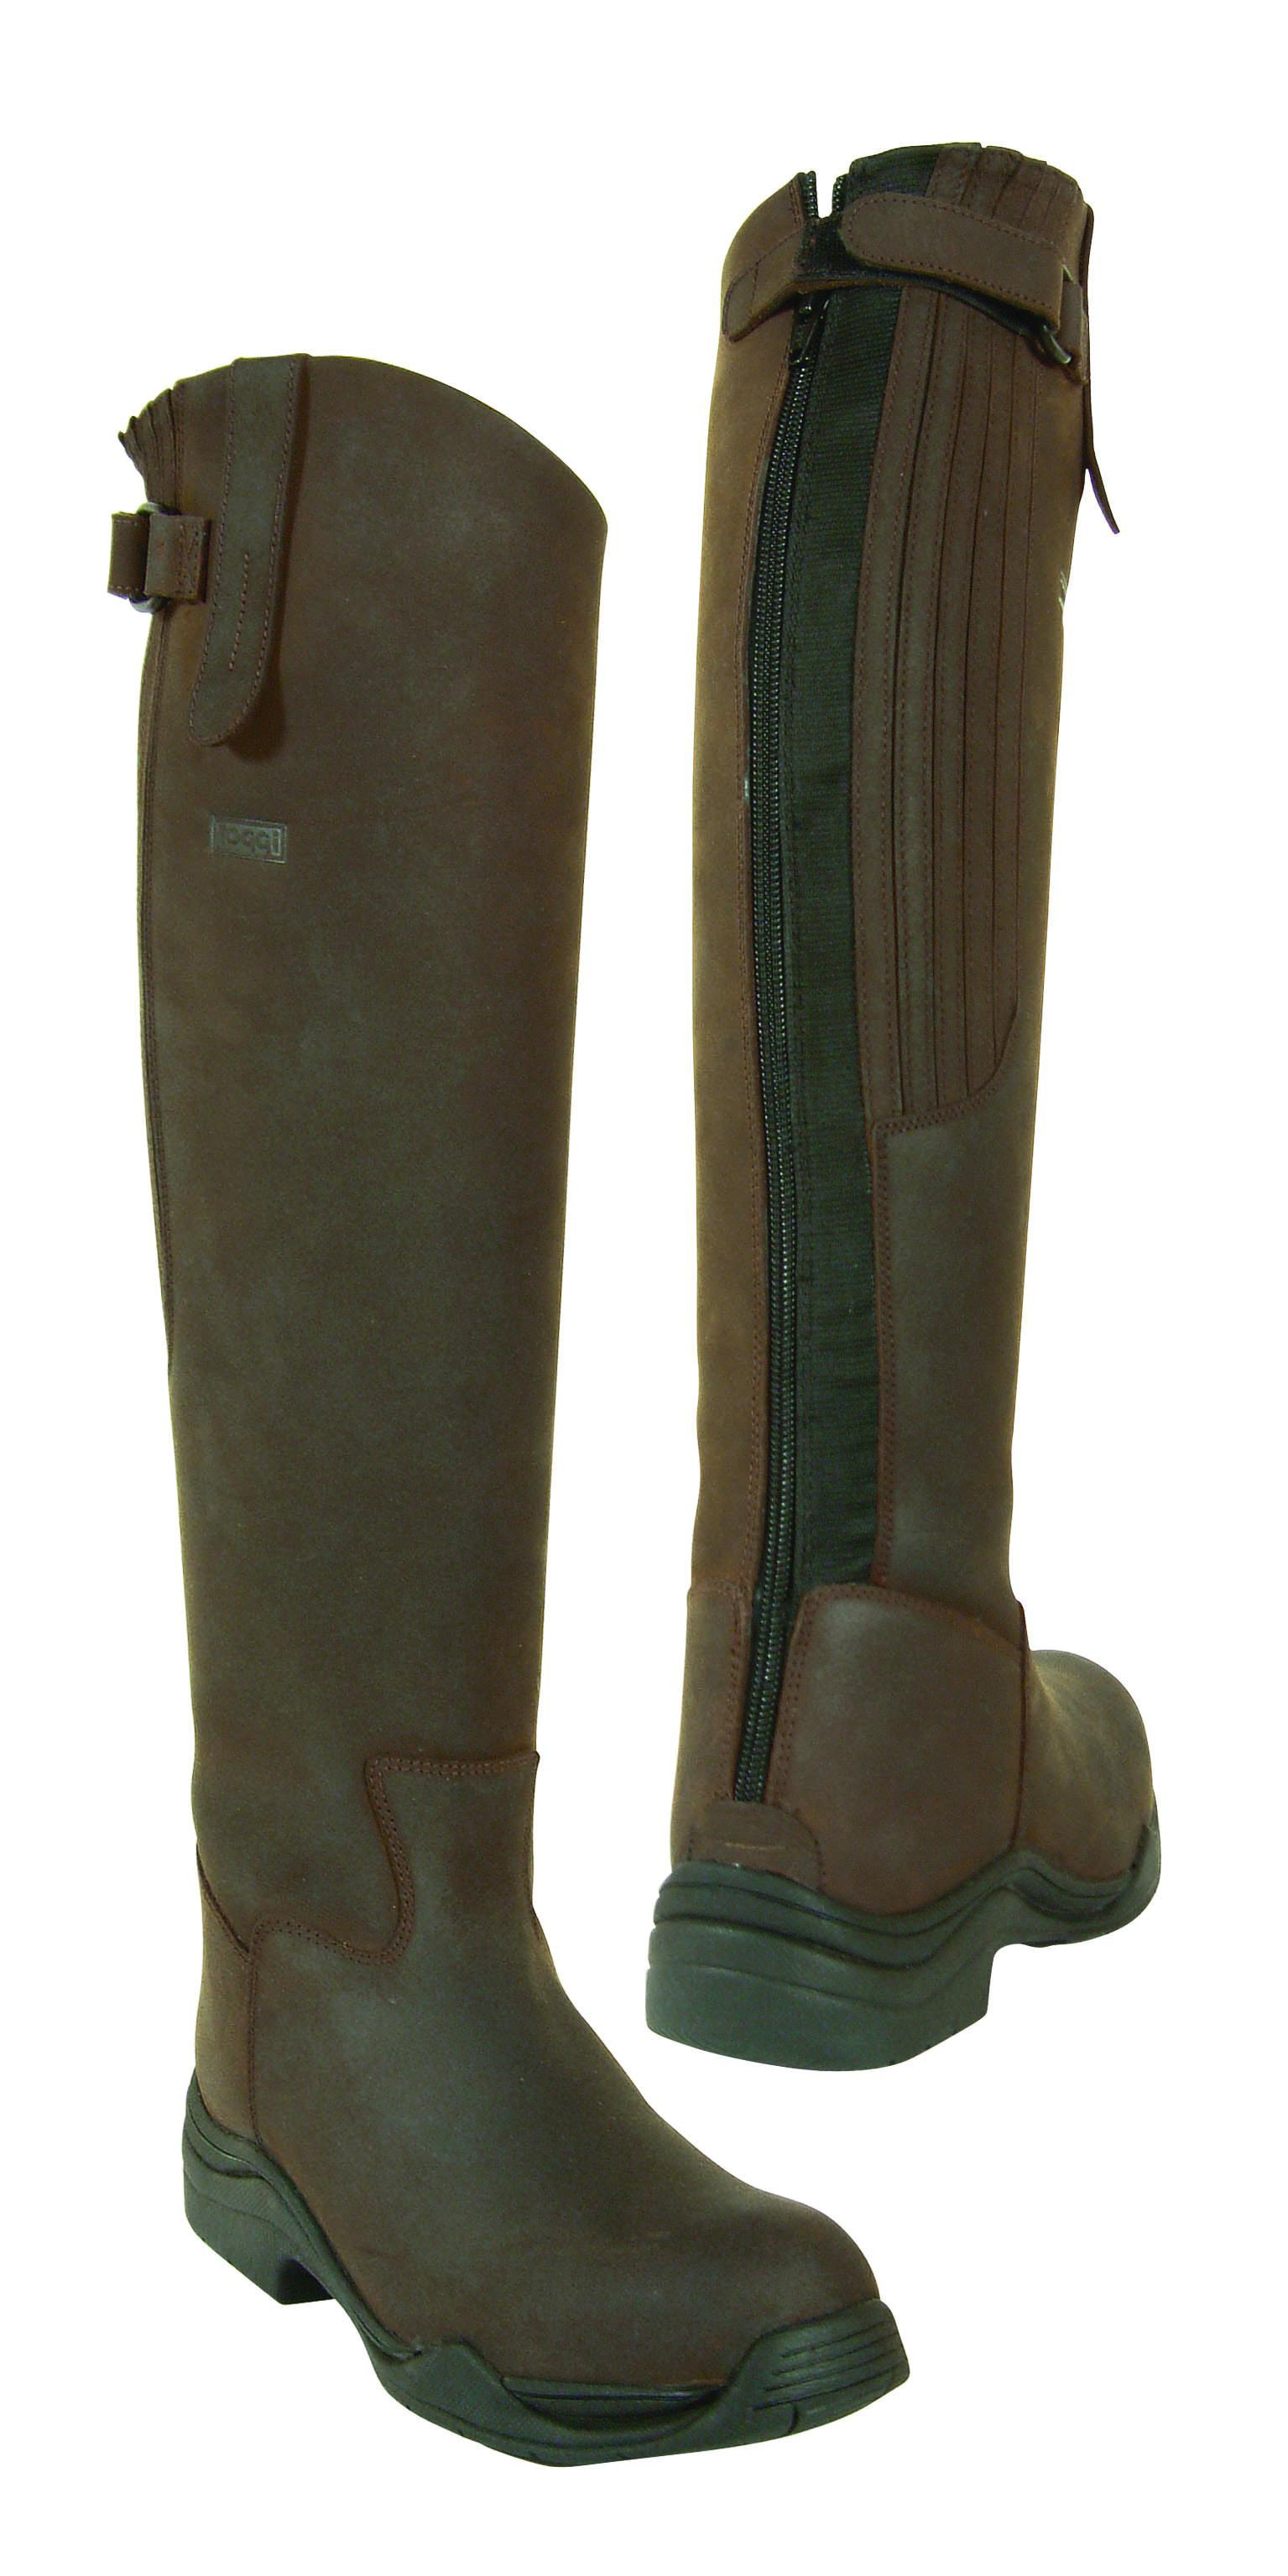 Toggi Calgary boots